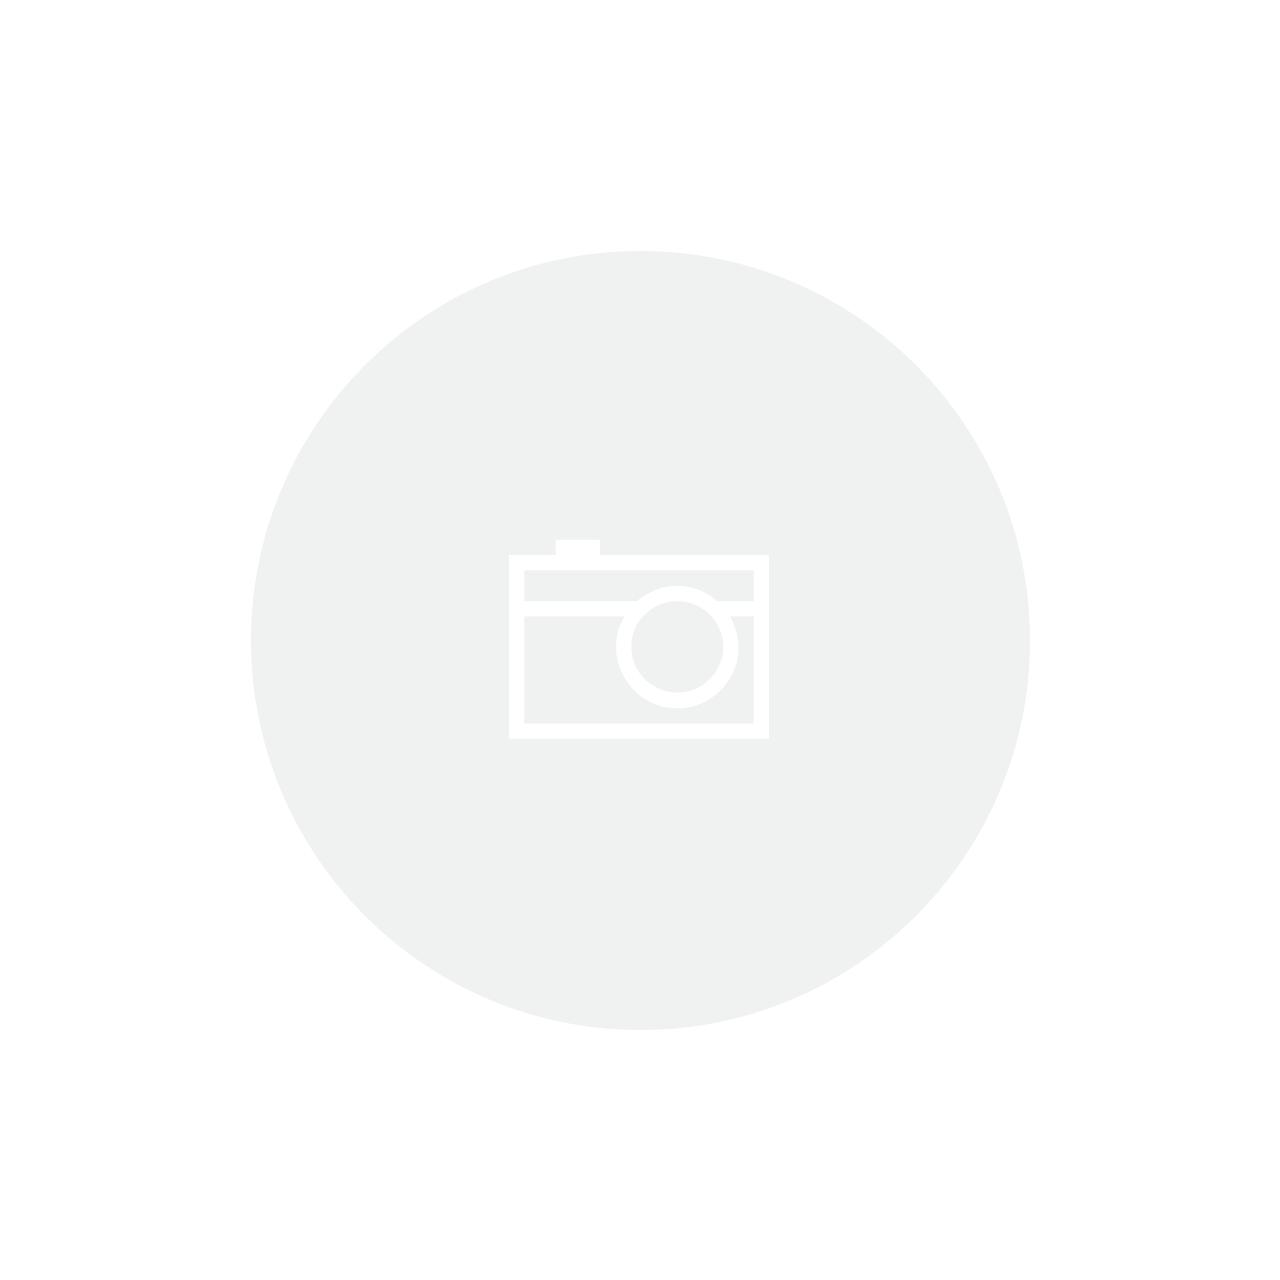 REMENDO VIPAL REDONDO PEQUENO R-00 UNIDADE (30mm)